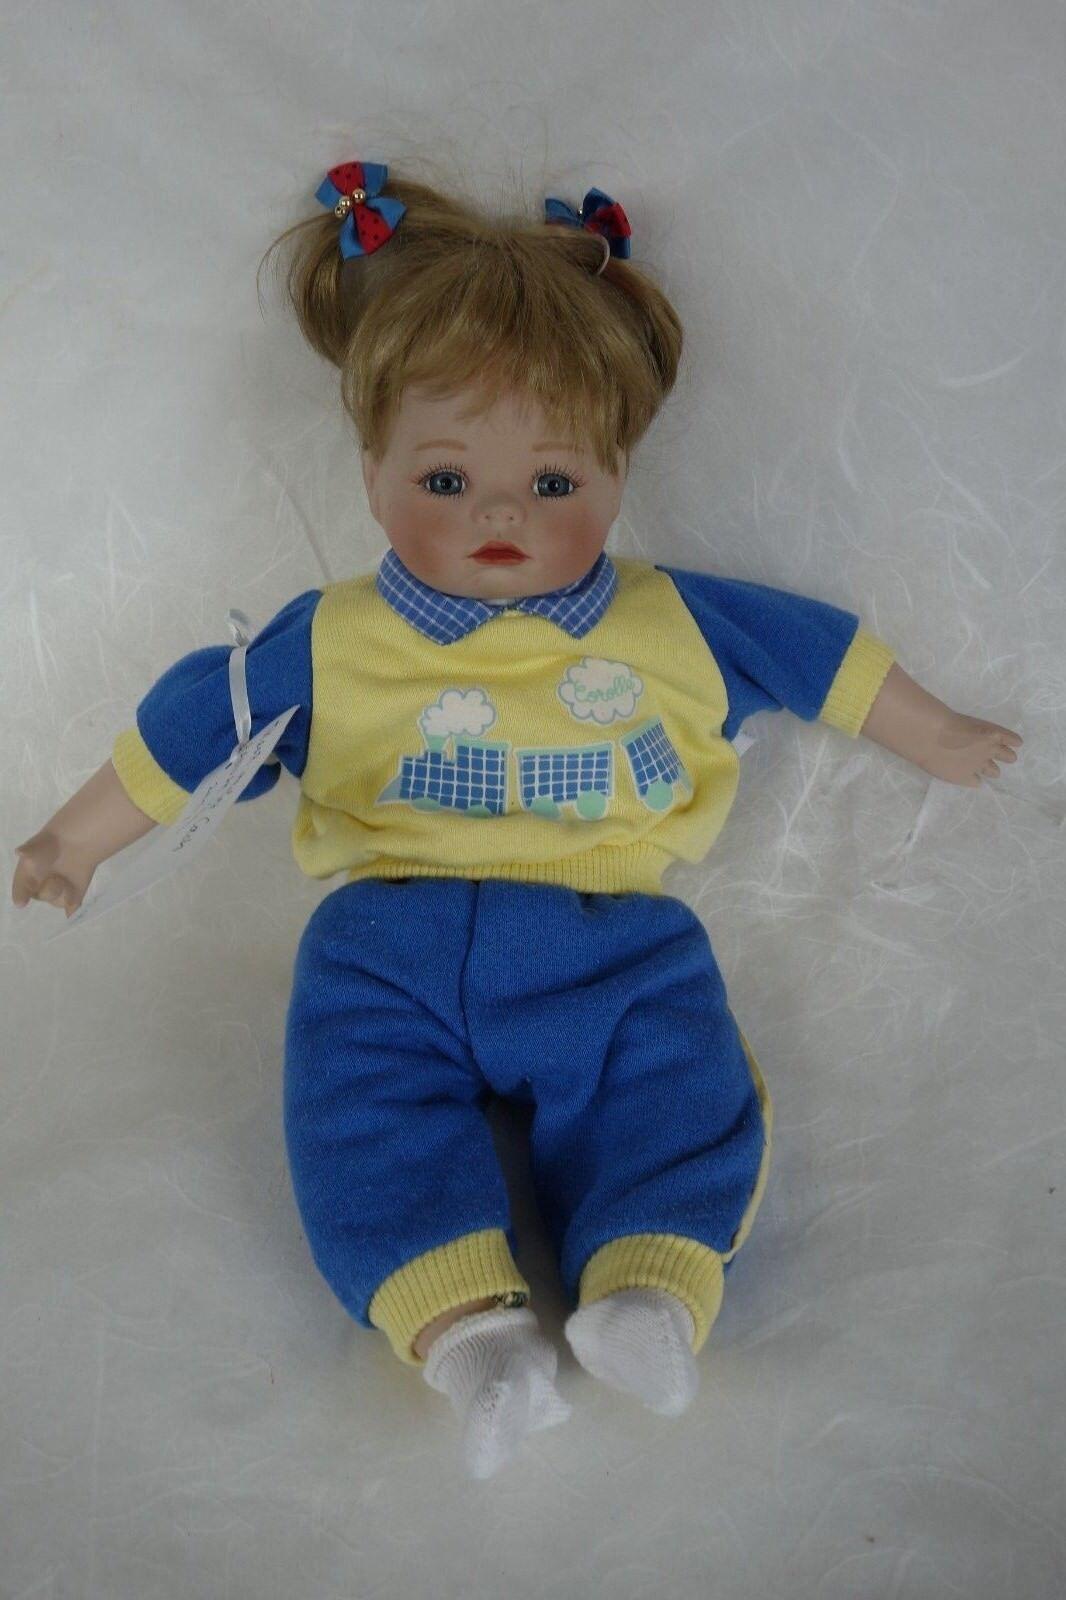 Puppe Hannah Hannah Hannah 1992 35 cm Künstlerpuppe Porzellanpuppe Deko 07ab68